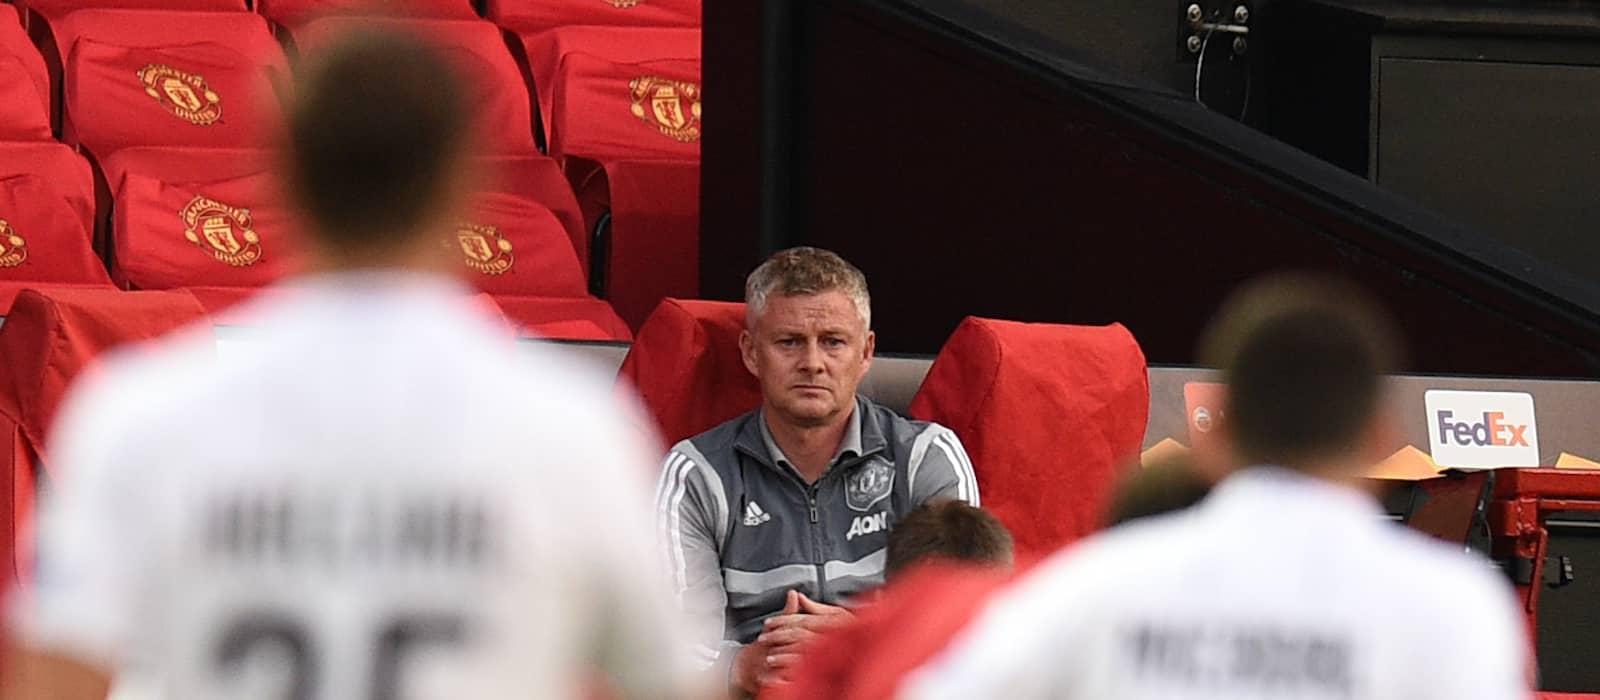 Gallery: Manchester United stars enjoy warm weather training ahead of Sevilla